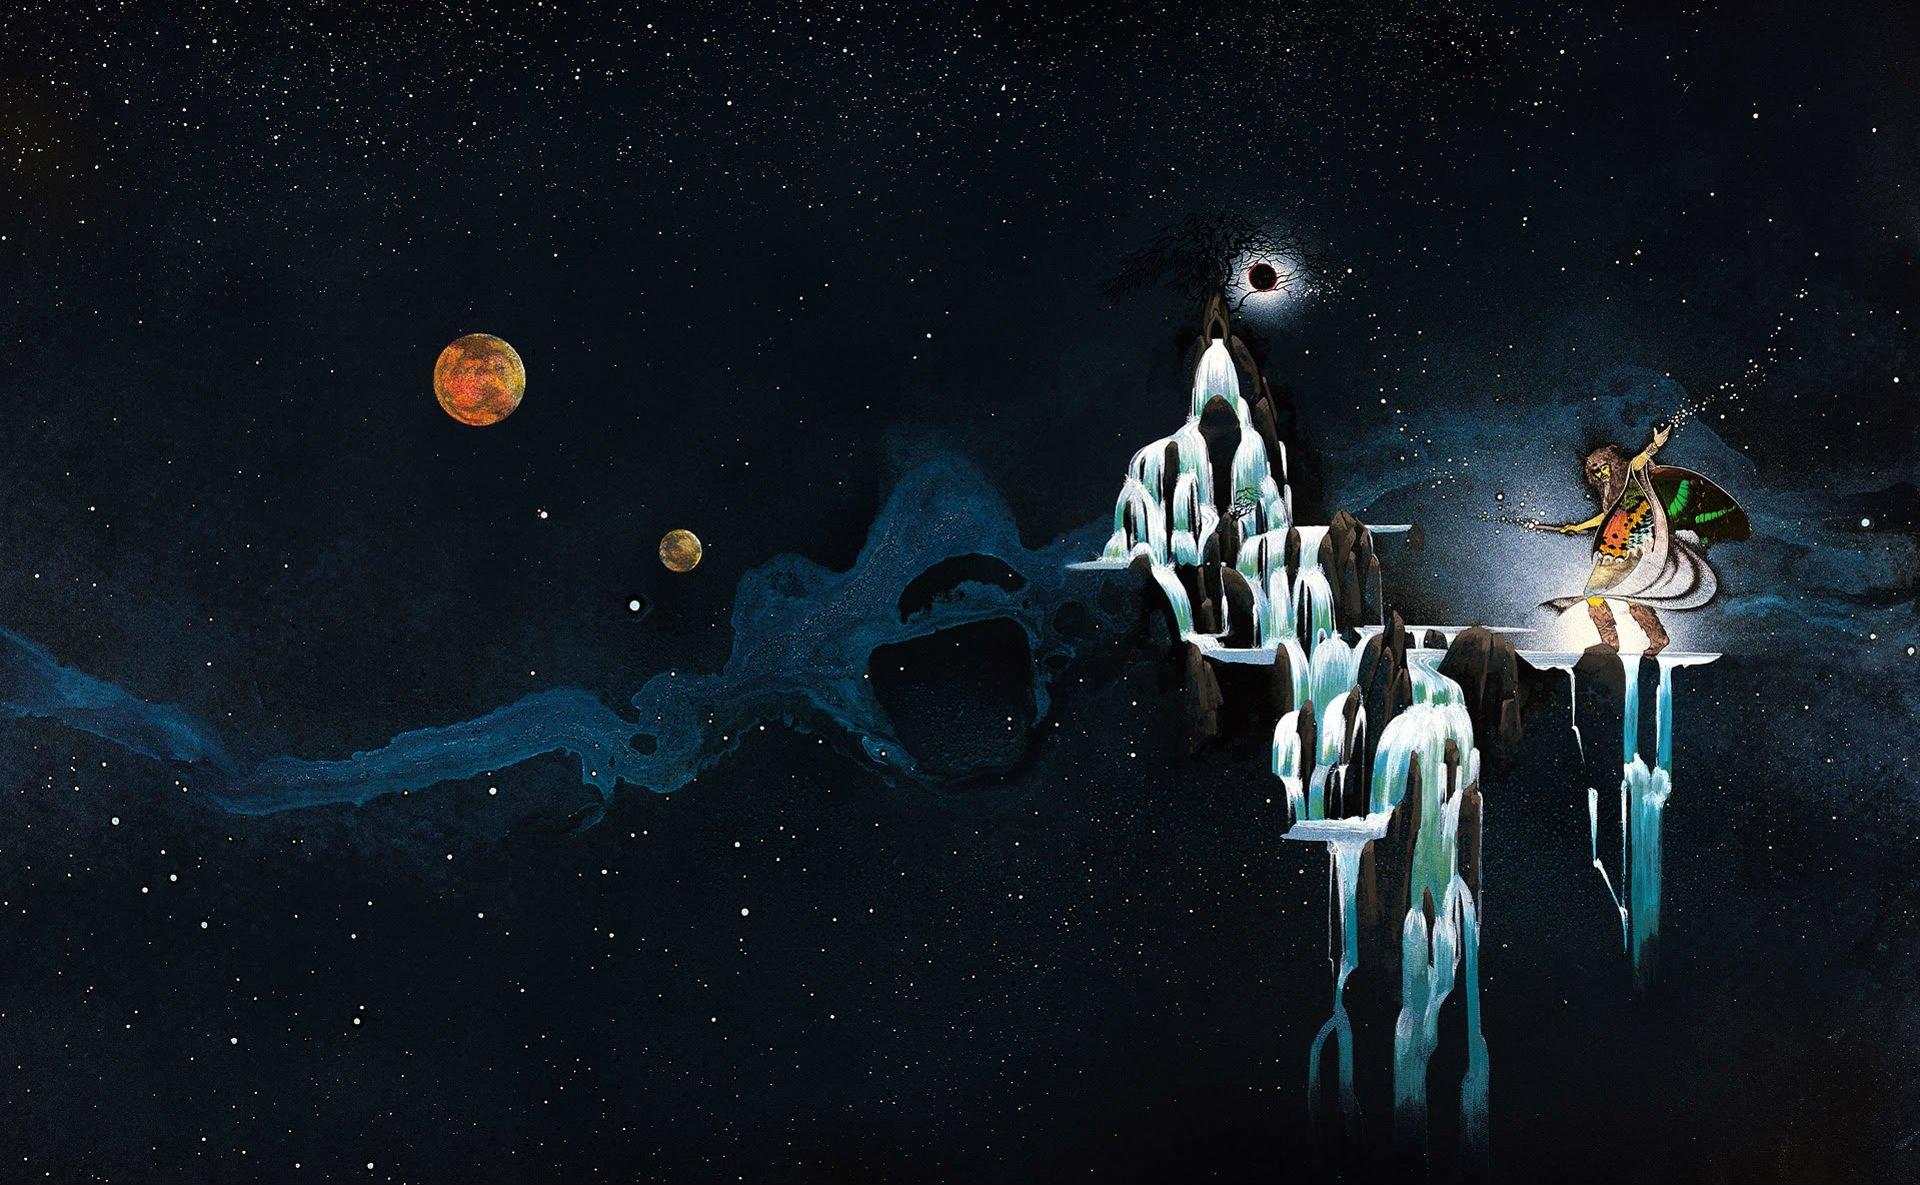 Space Demonic Art Hd Wallpaper: Uriah Heep – Demons And Wizards HD Wallpaper